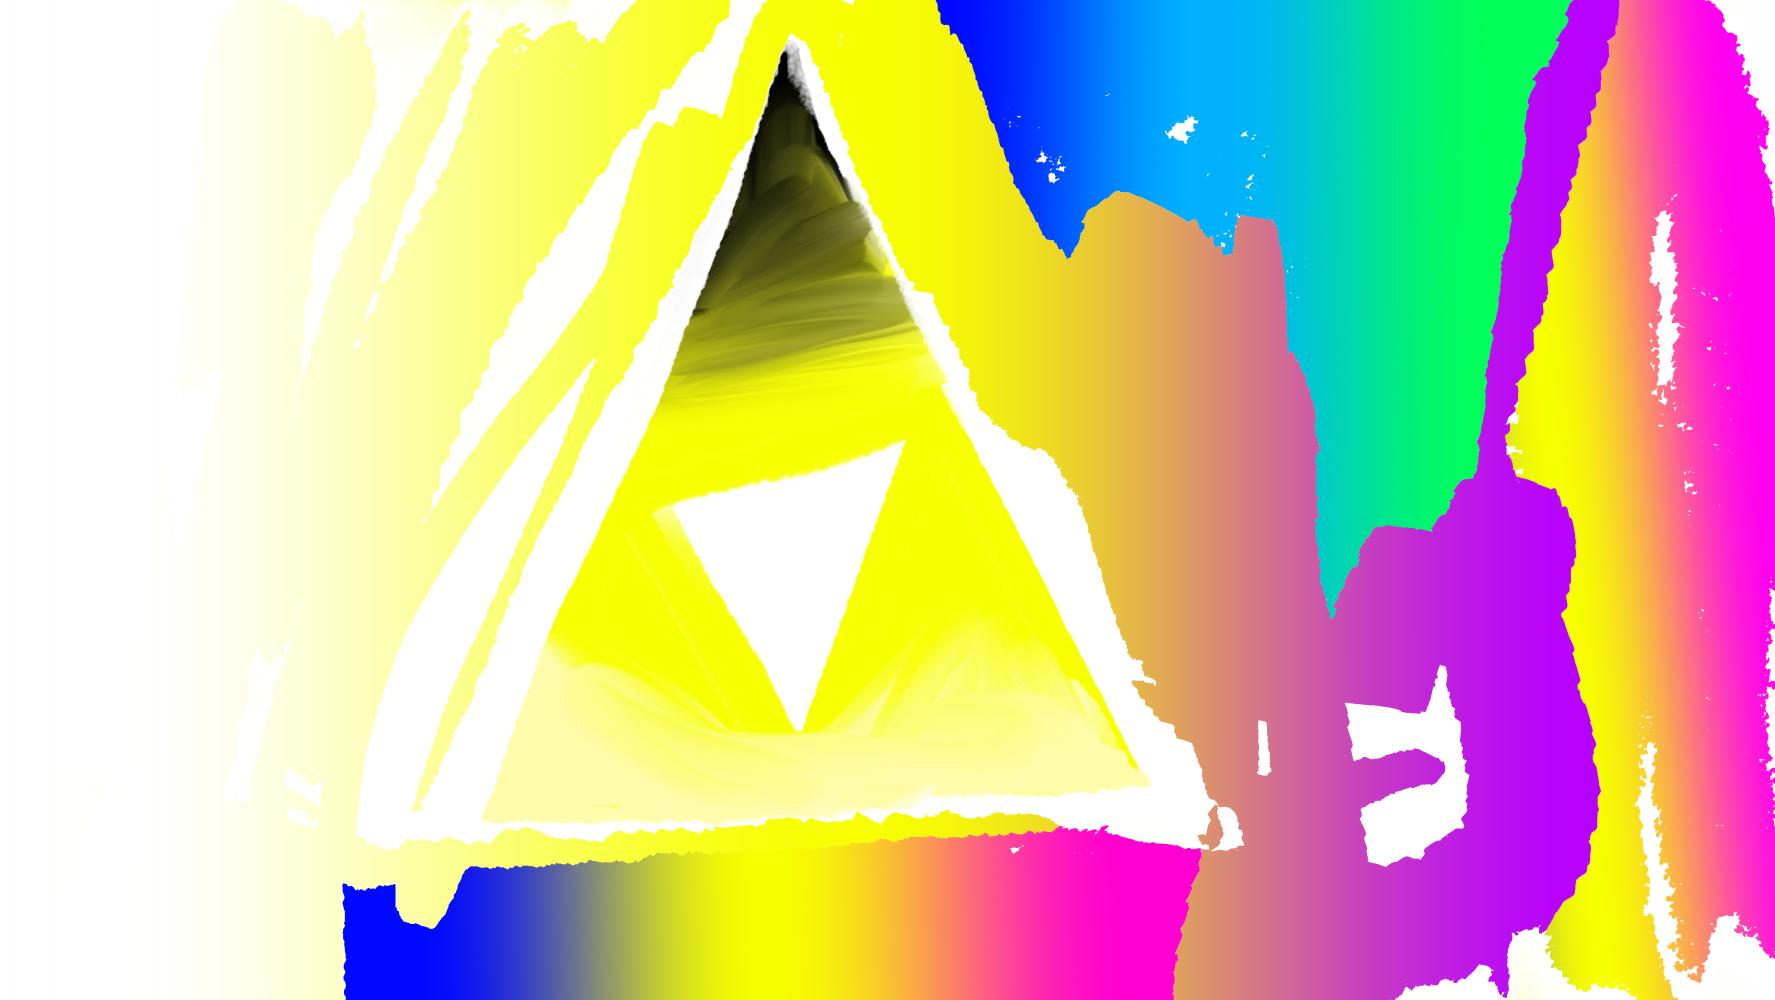 Rainbow Triforce by ArtLoverIris